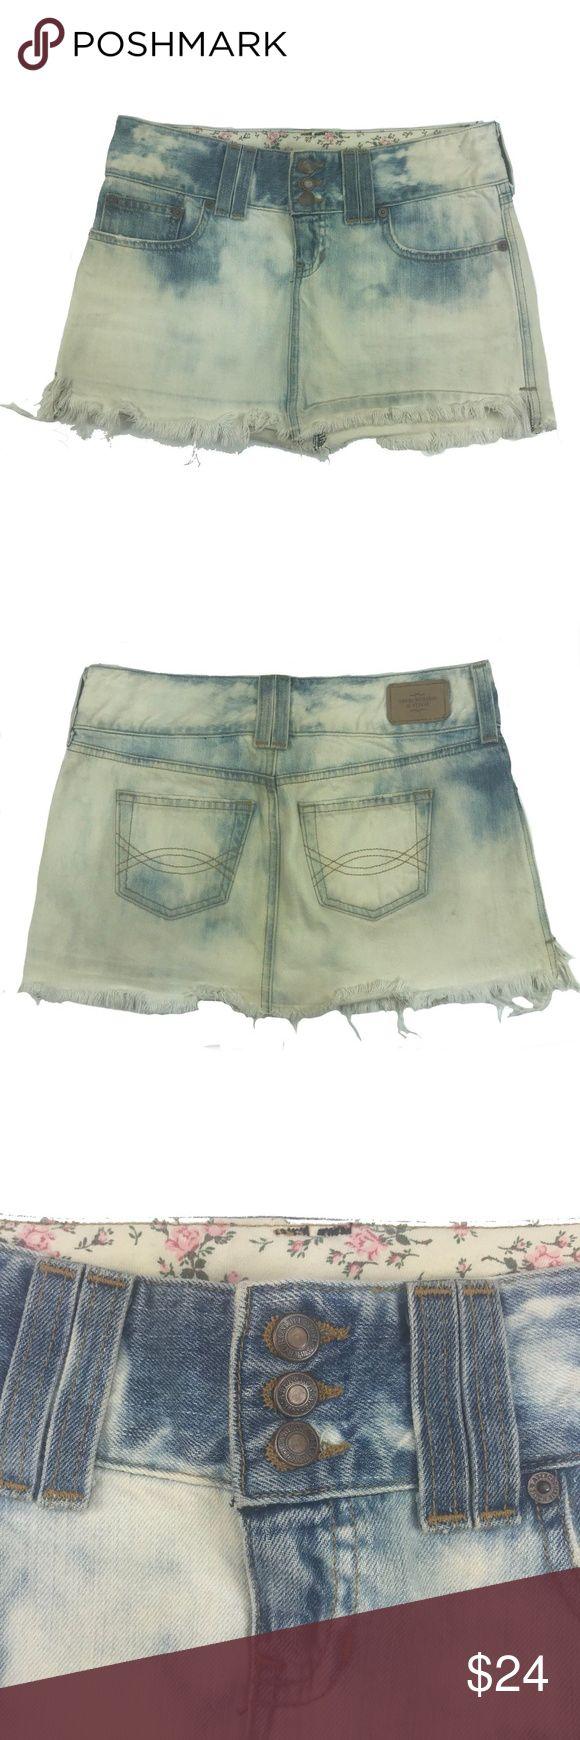 "Jean Skirt Womens 2 31"" Festival Denim Acid Wash Pre-owned condition.  MEASUREMENTS: Waist: 31"" Length: 12"" C Abercrombie & Fitch Skirts Pencil"